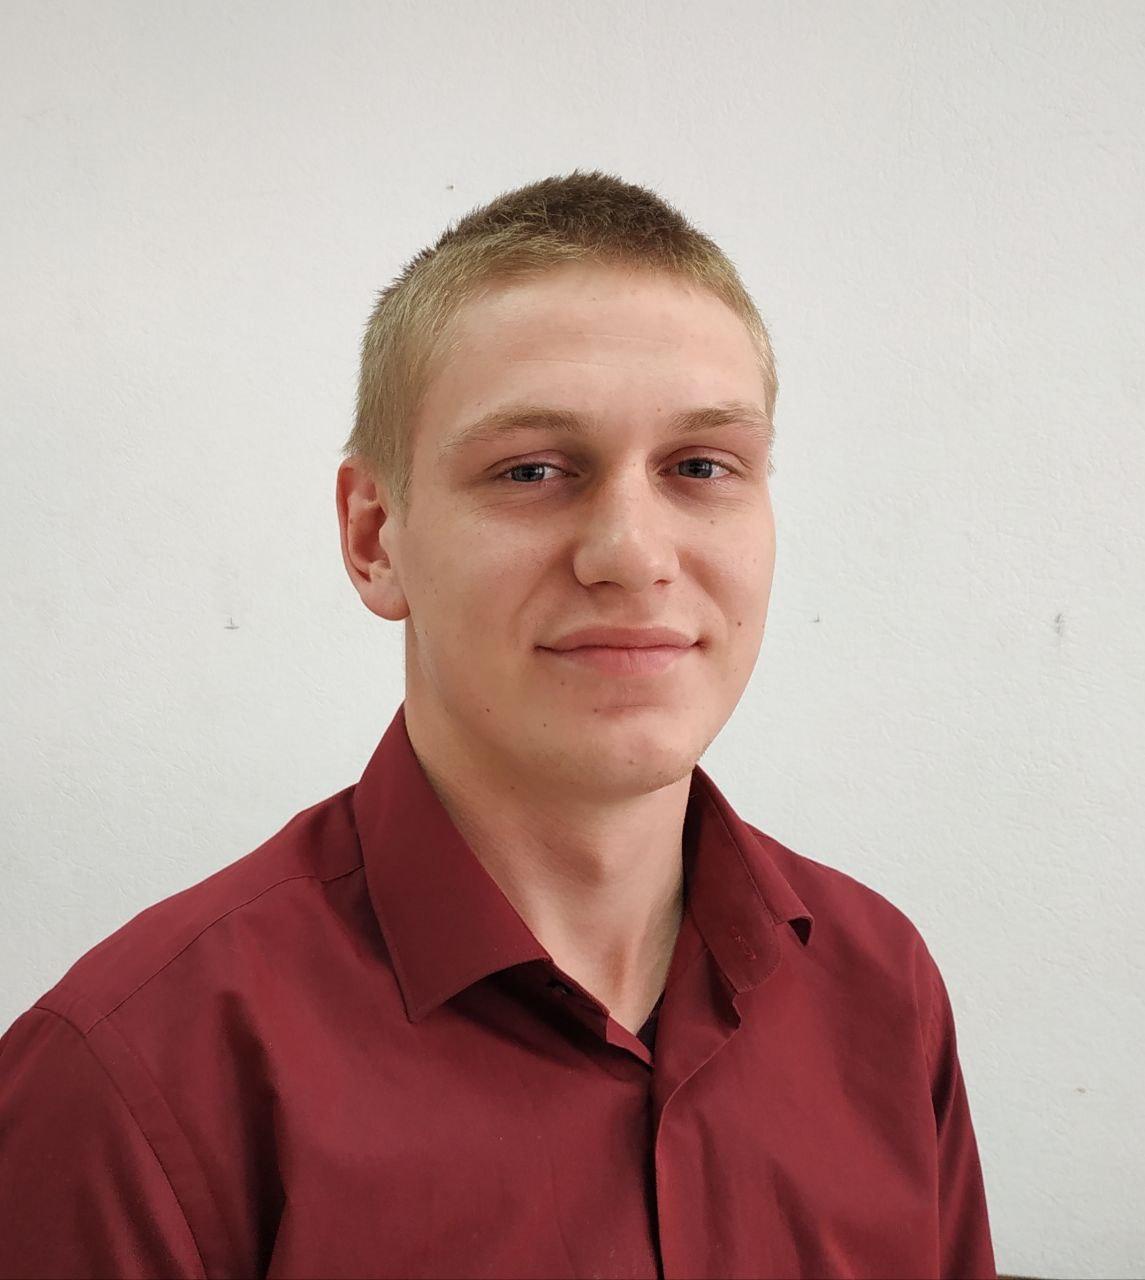 Панфилов Александр Дмитриевич